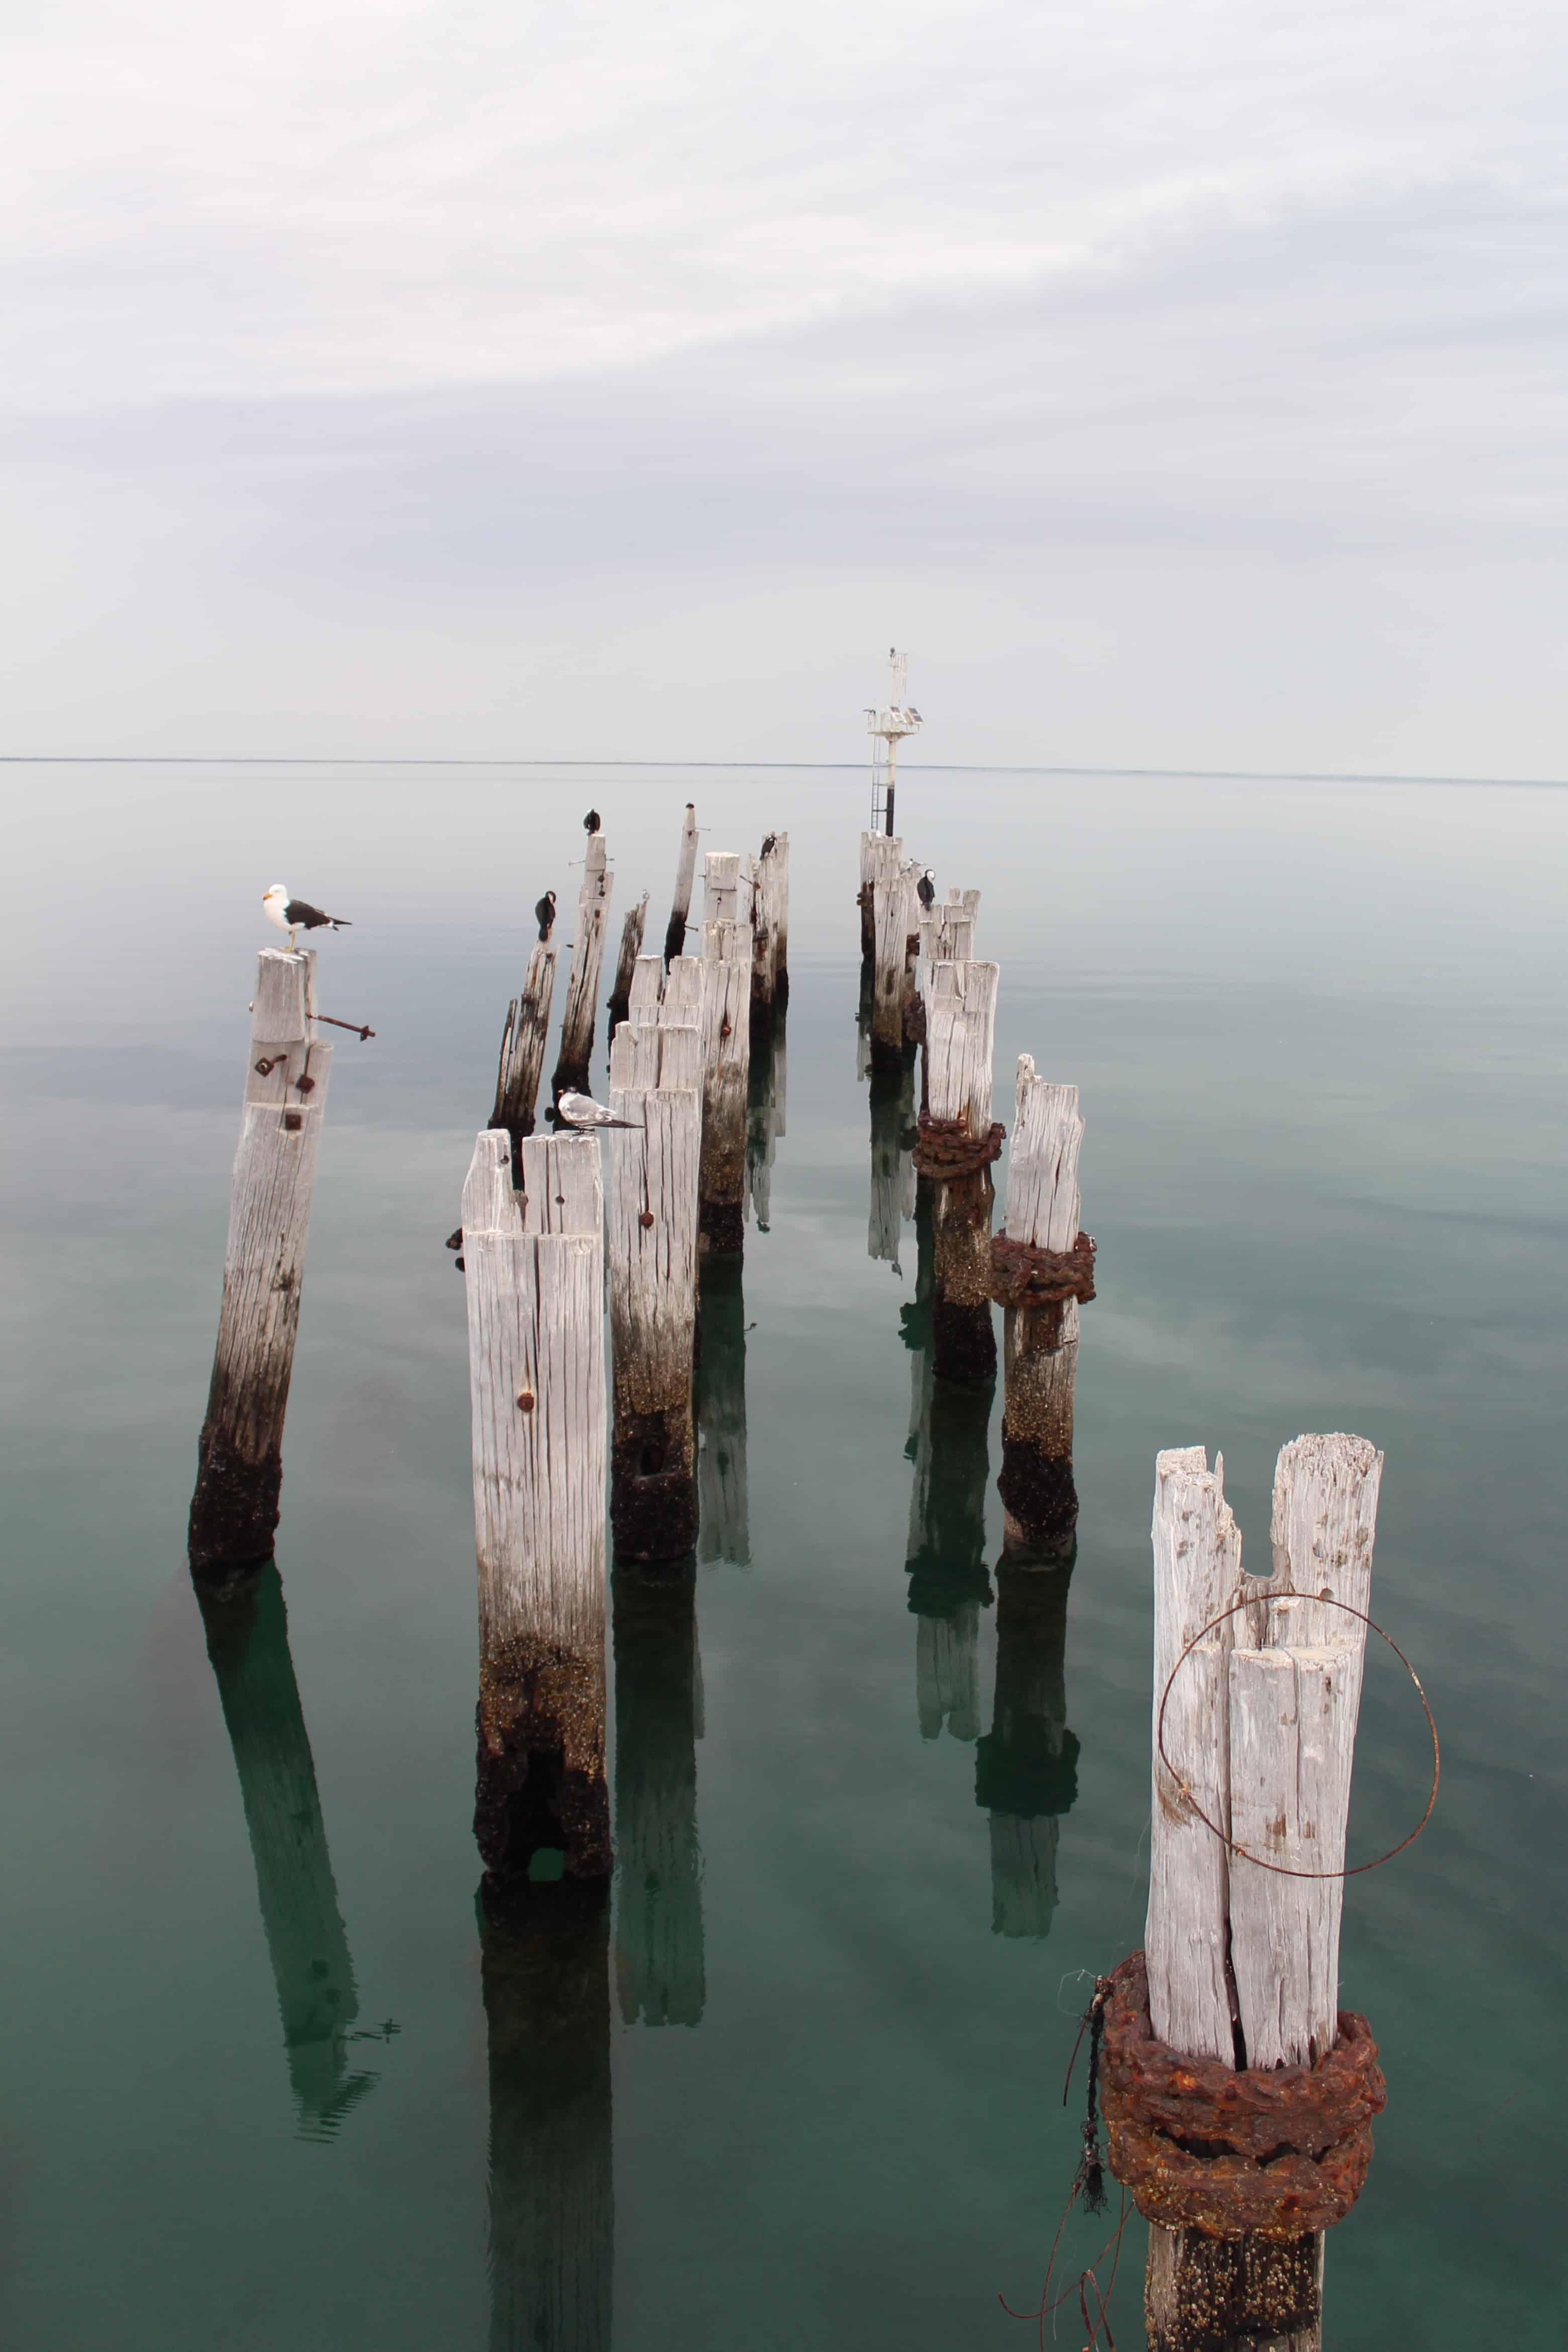 Seabirds enjoying the sanctuary of old jetty pylons.